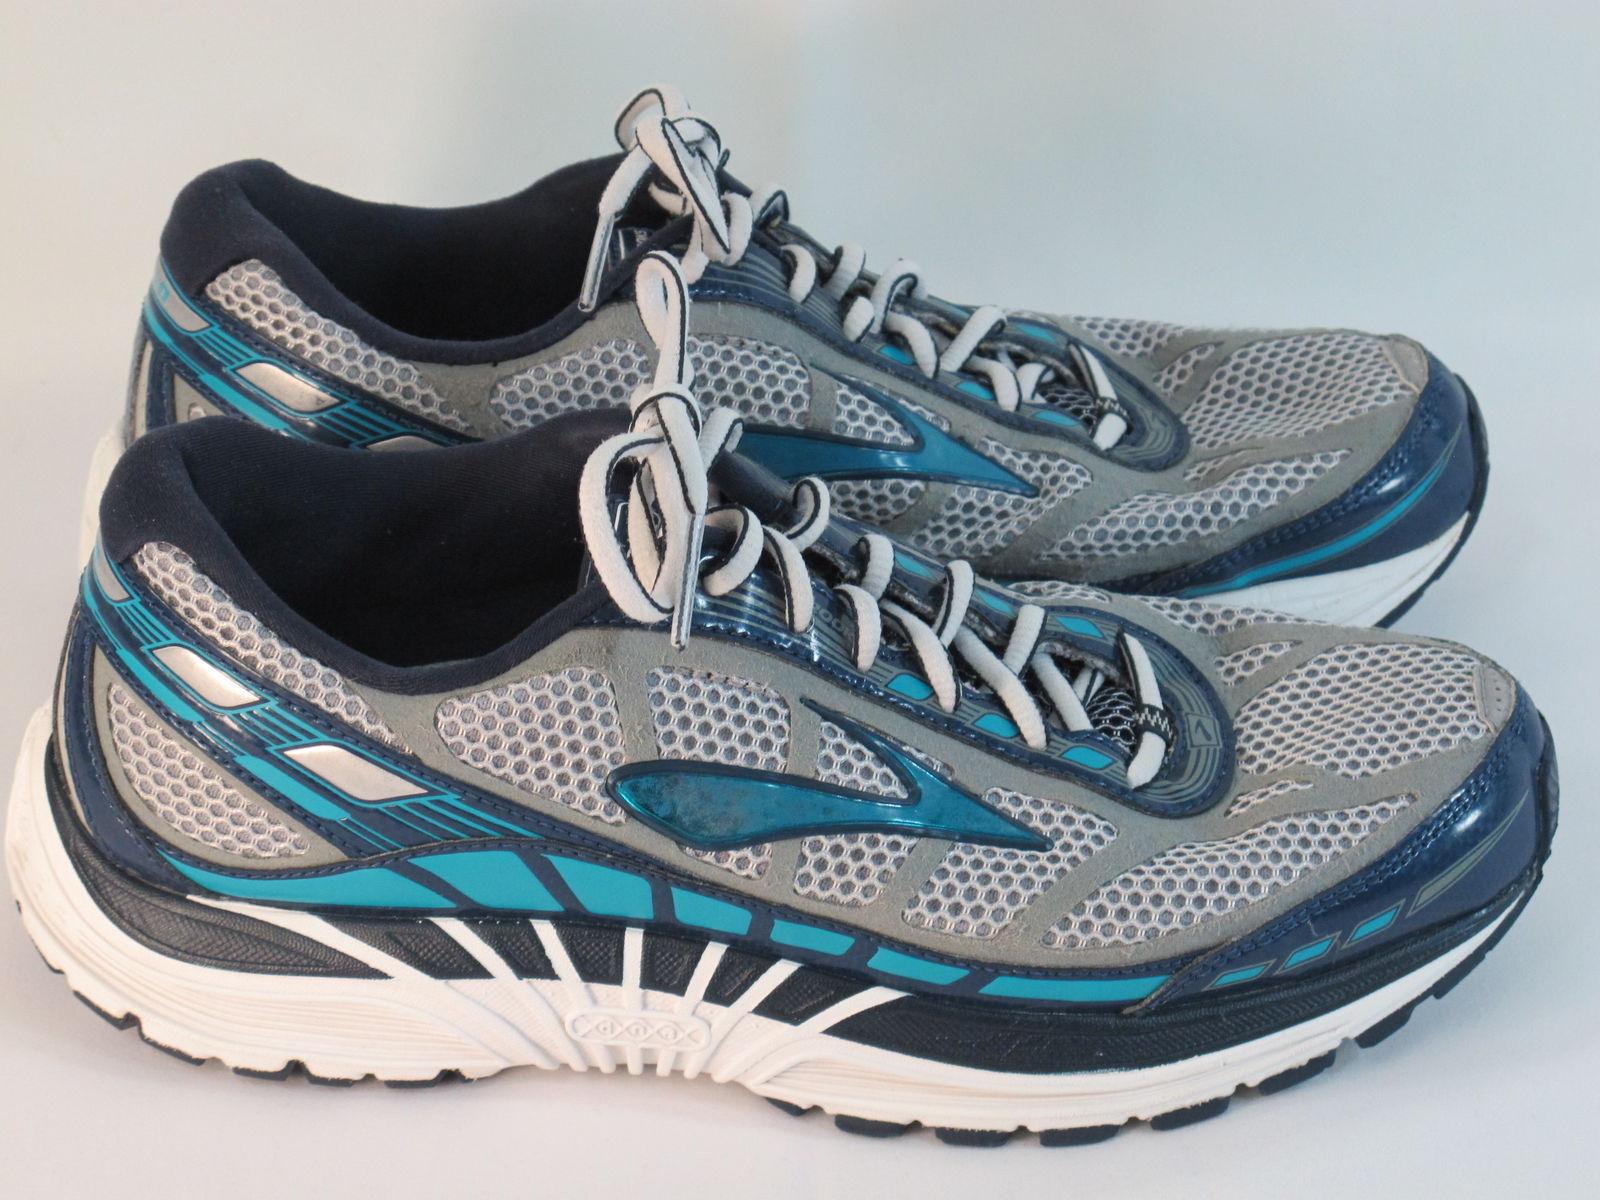 289510b5cdb Brooks Dyad 8 Running Shoes Women s Size 9.5 and 50 similar items. S l1600